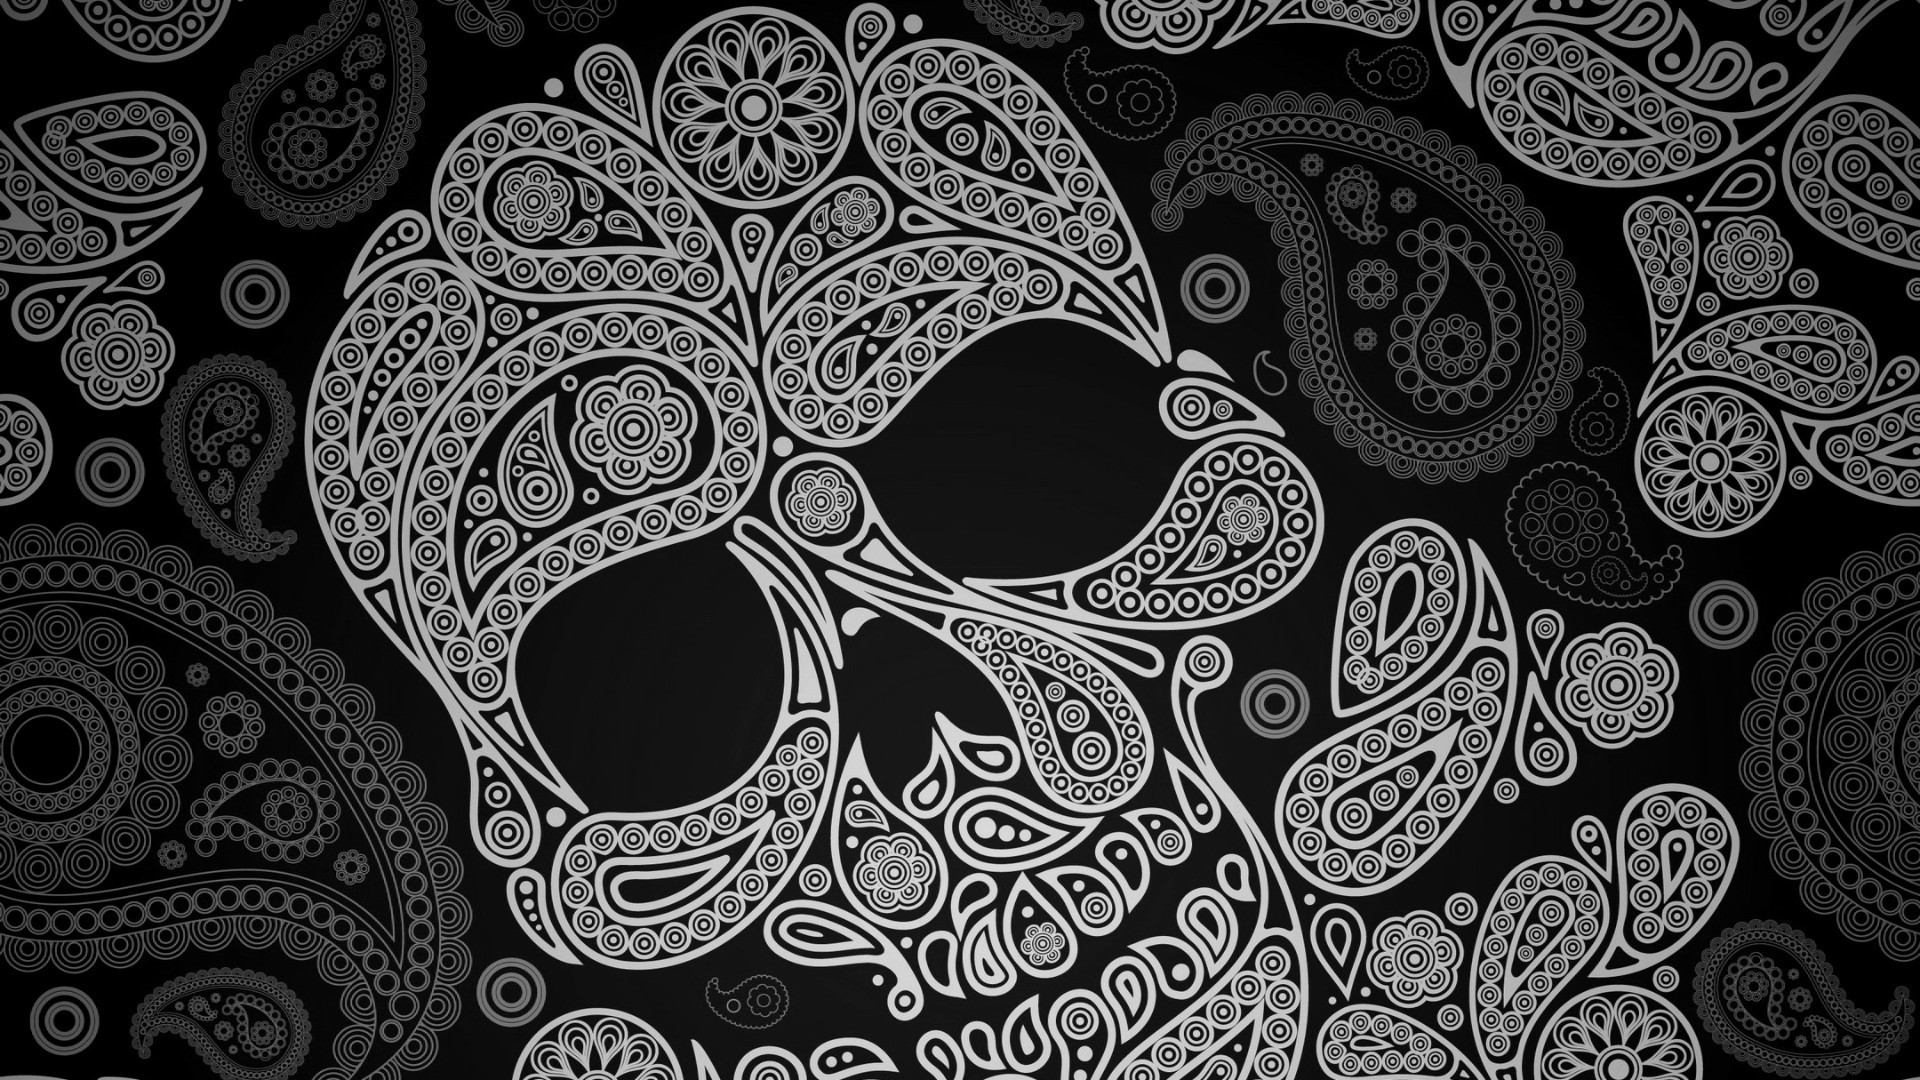 Sugar Skull Wallpapers (60+ images)